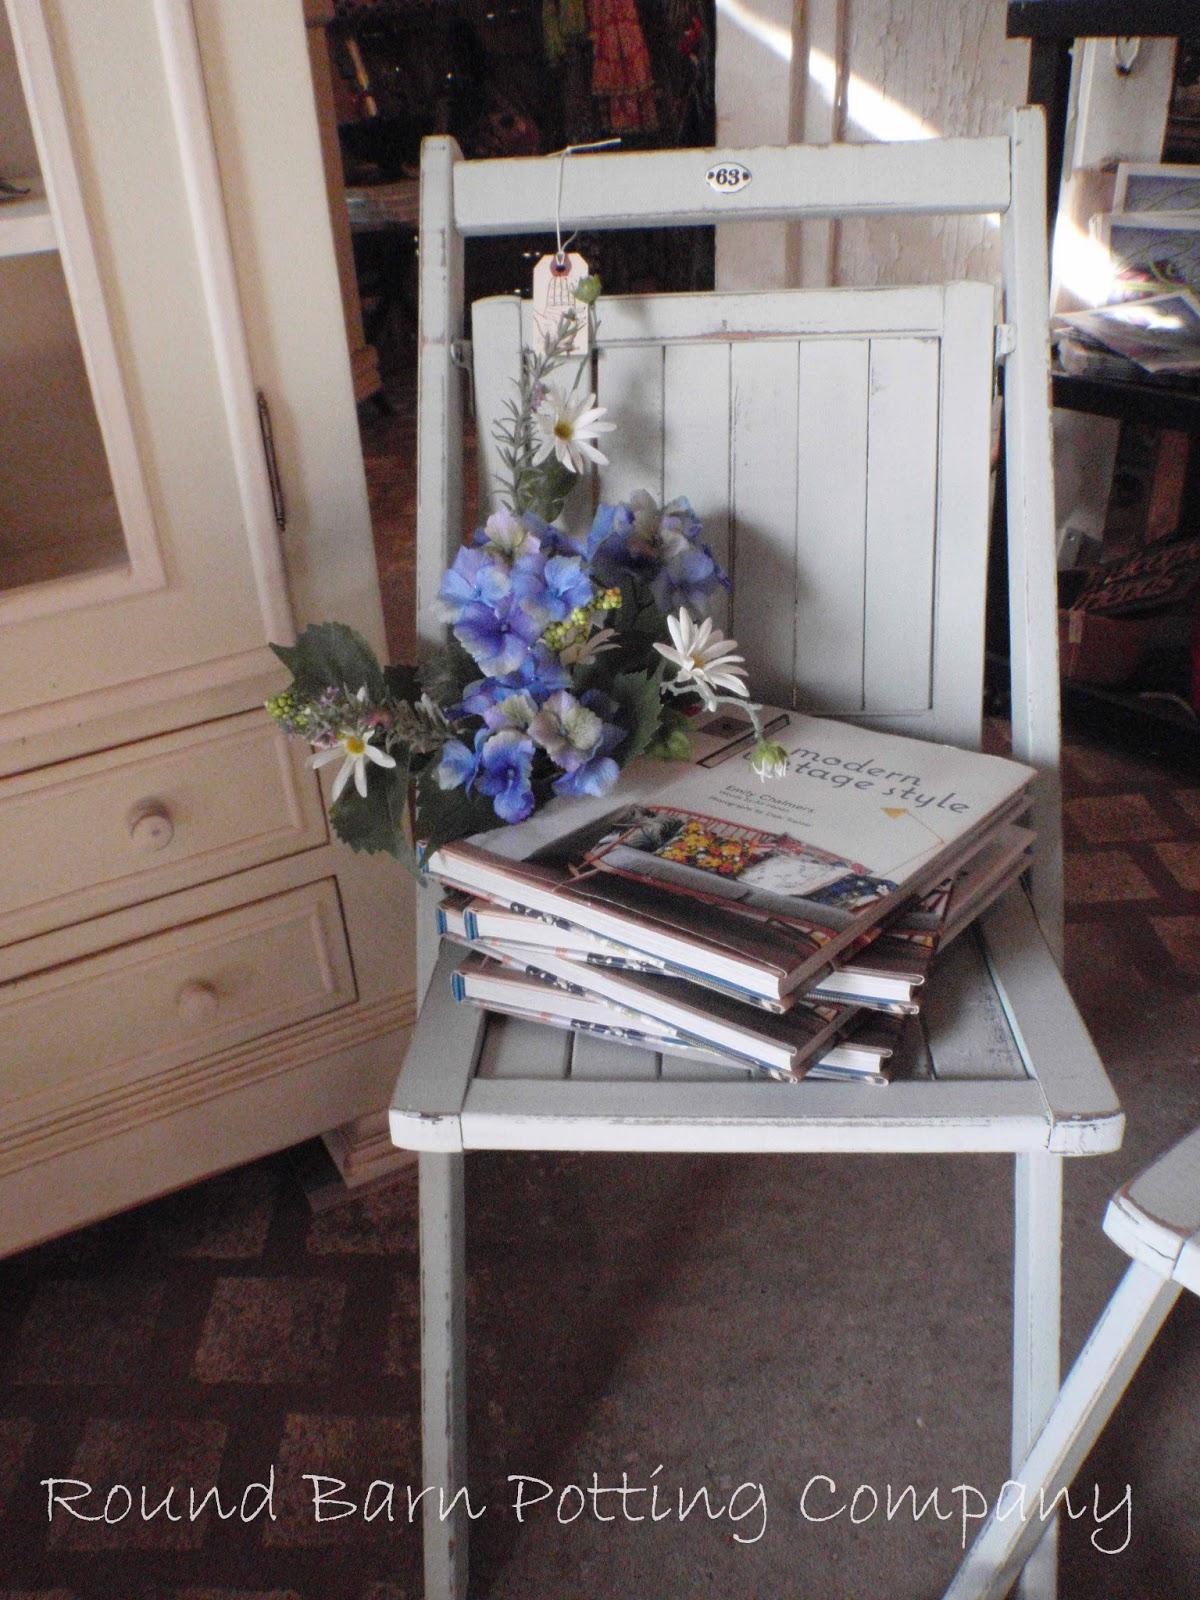 Lori Miller S Round Barn Potting Company Summer Garden Bash